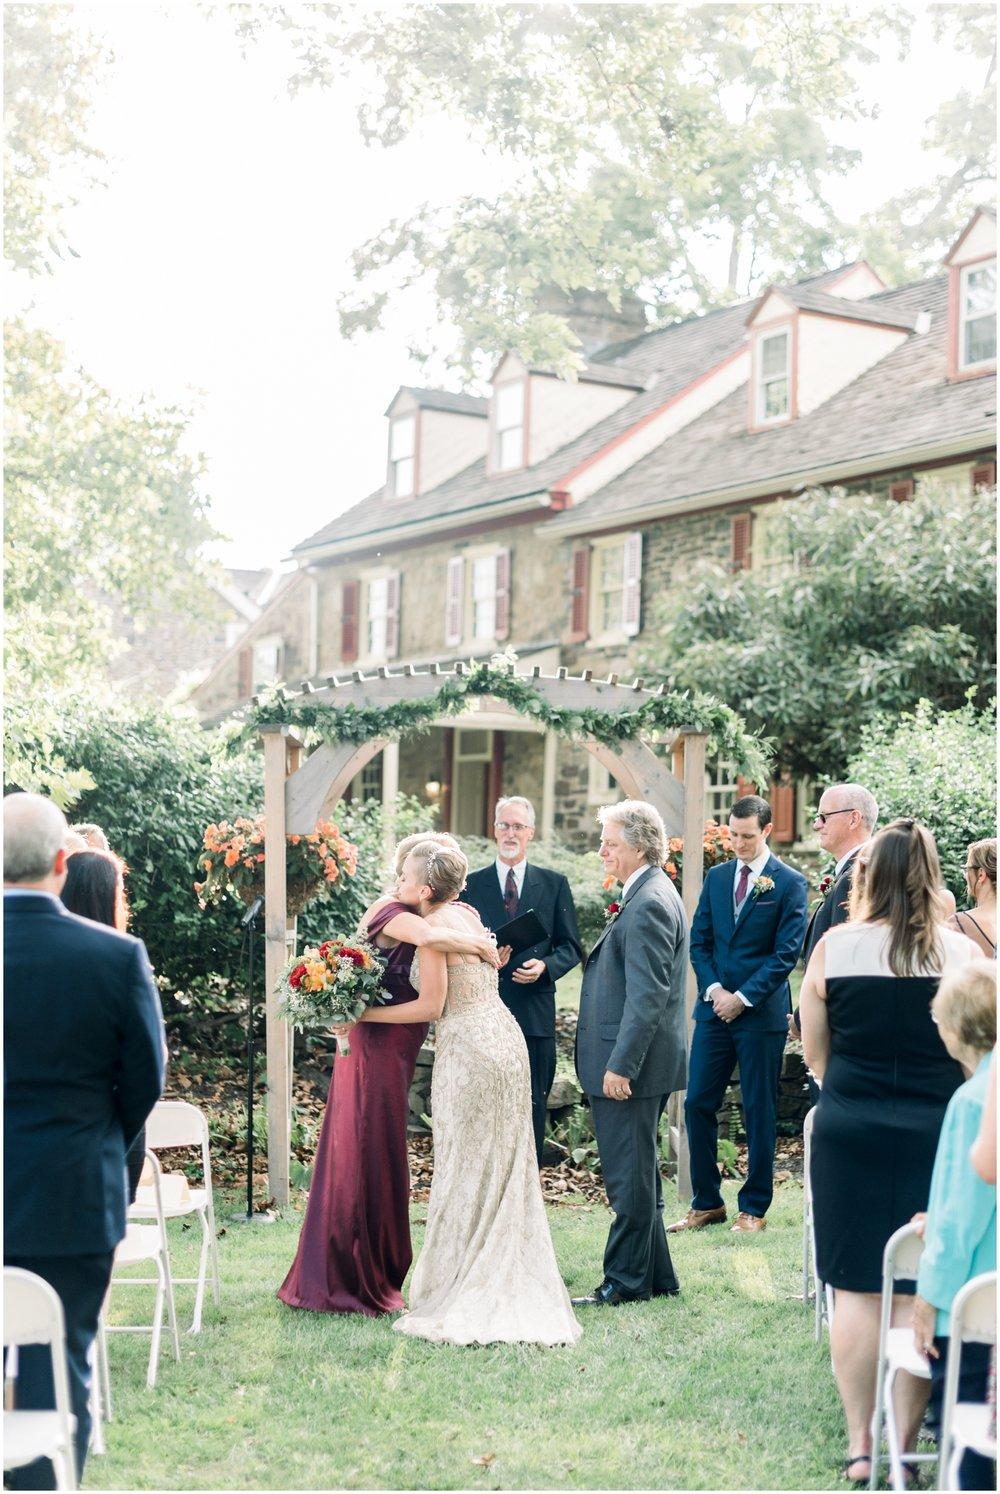 Summer Wedding at Joseph Ambler Inn - Krista Brackin Photography_0106.jpg